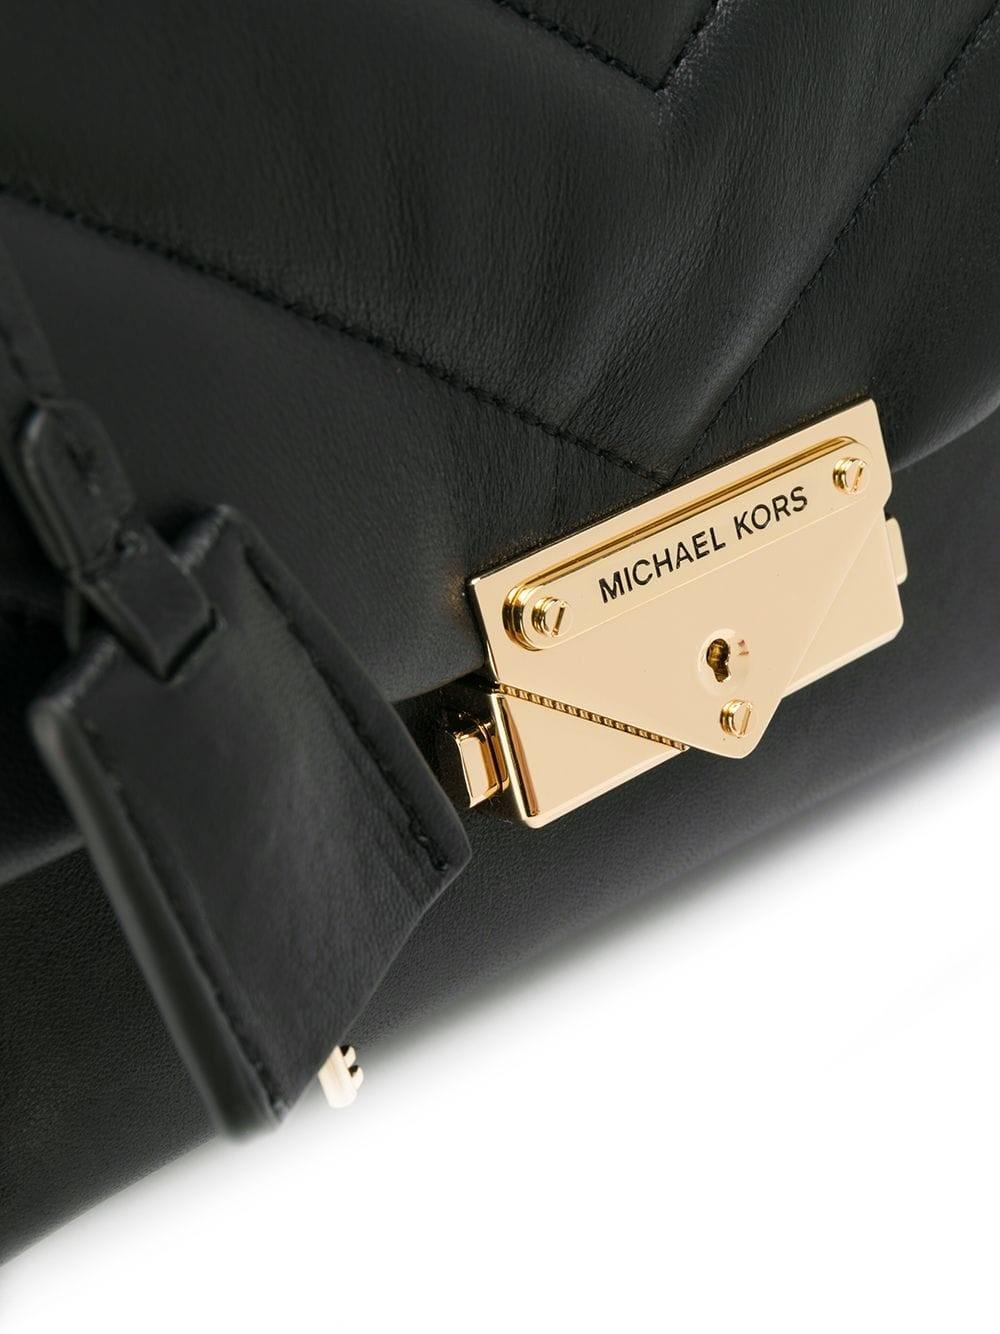 7def706150b104 michael kors mk CHAIN SHOULDER BAG available on montiboutique.com ...